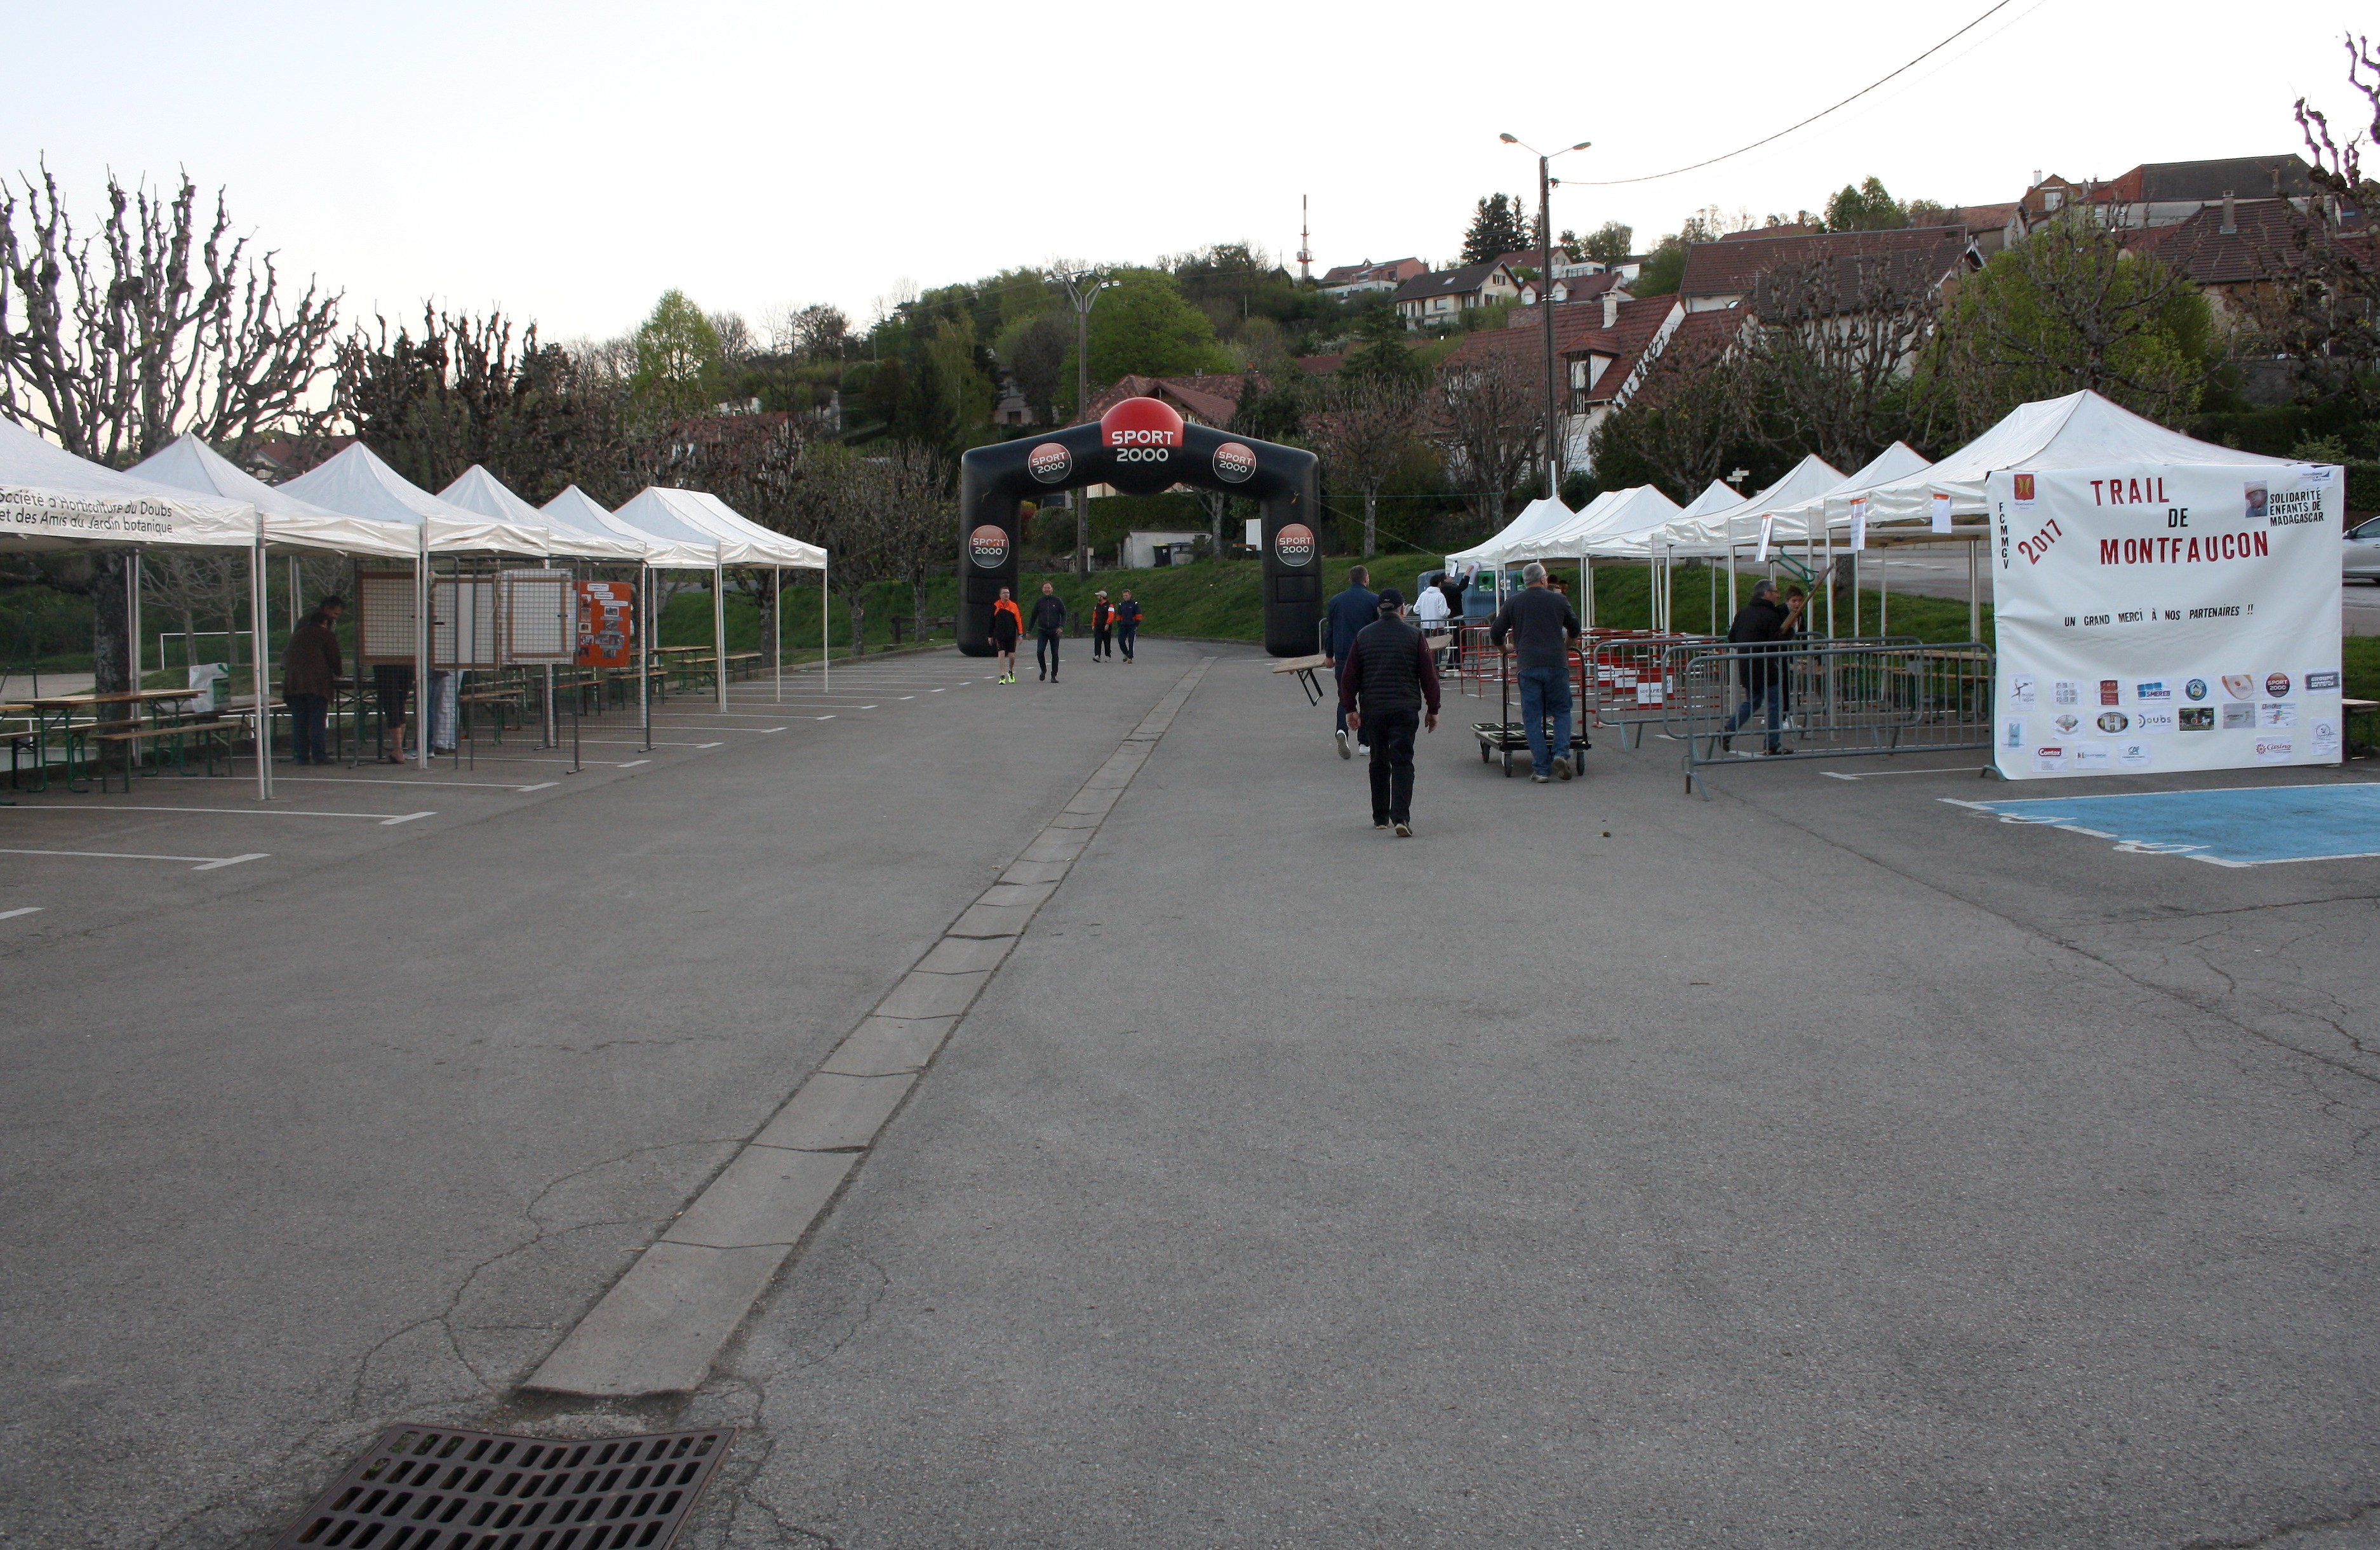 2017-04-09 - Trail-Montfaucon (21)